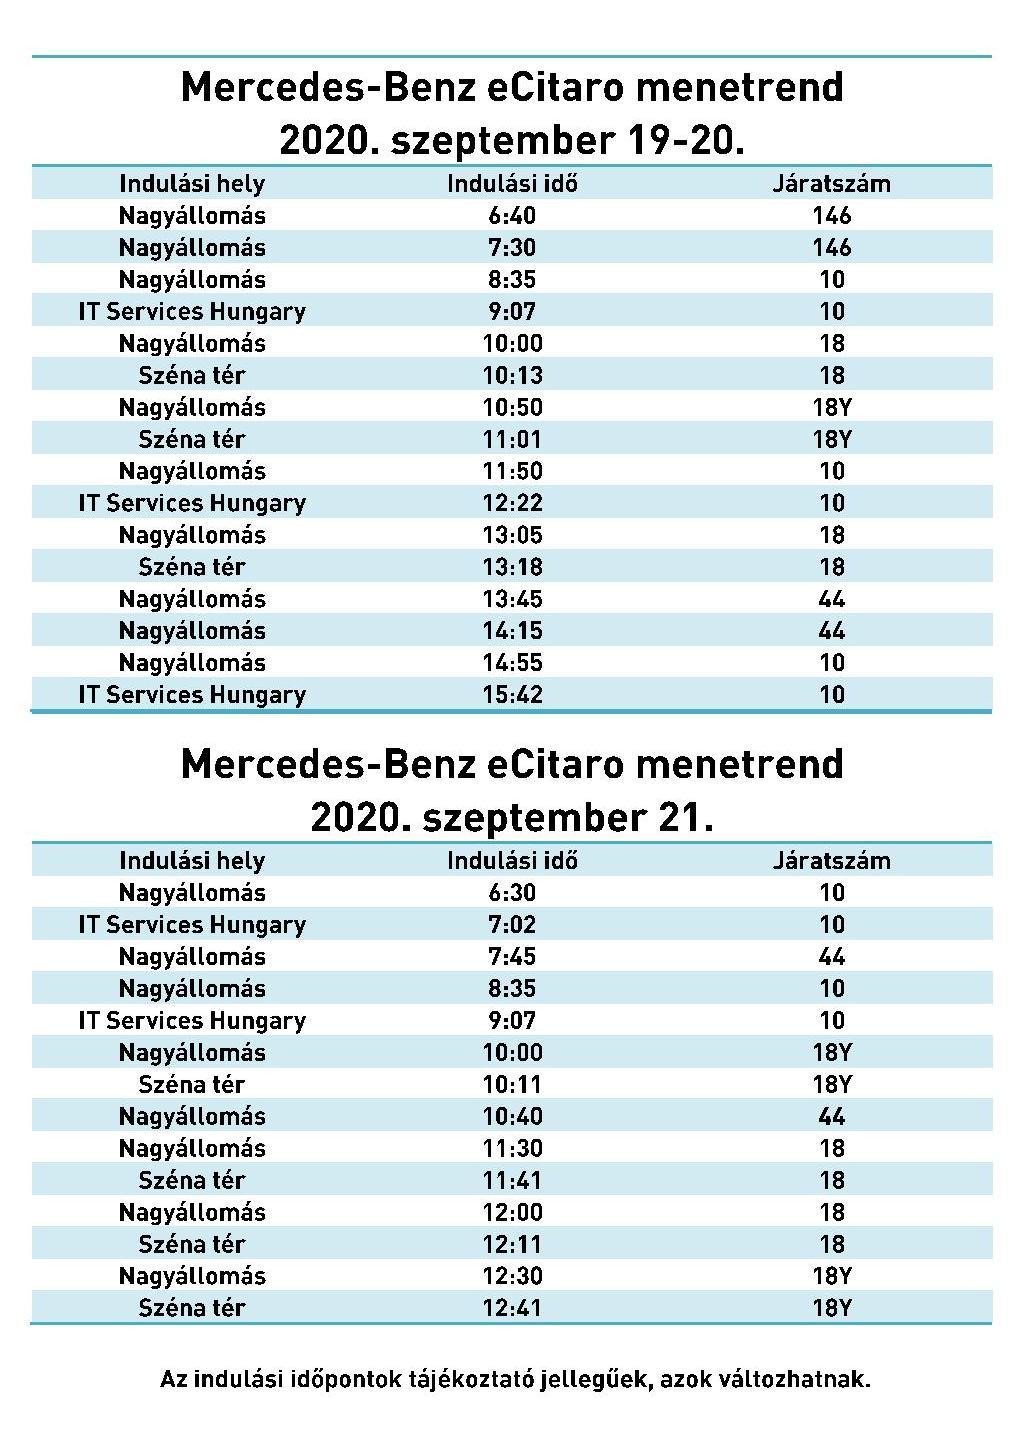 44 Es Busz Debrecen Menetrend